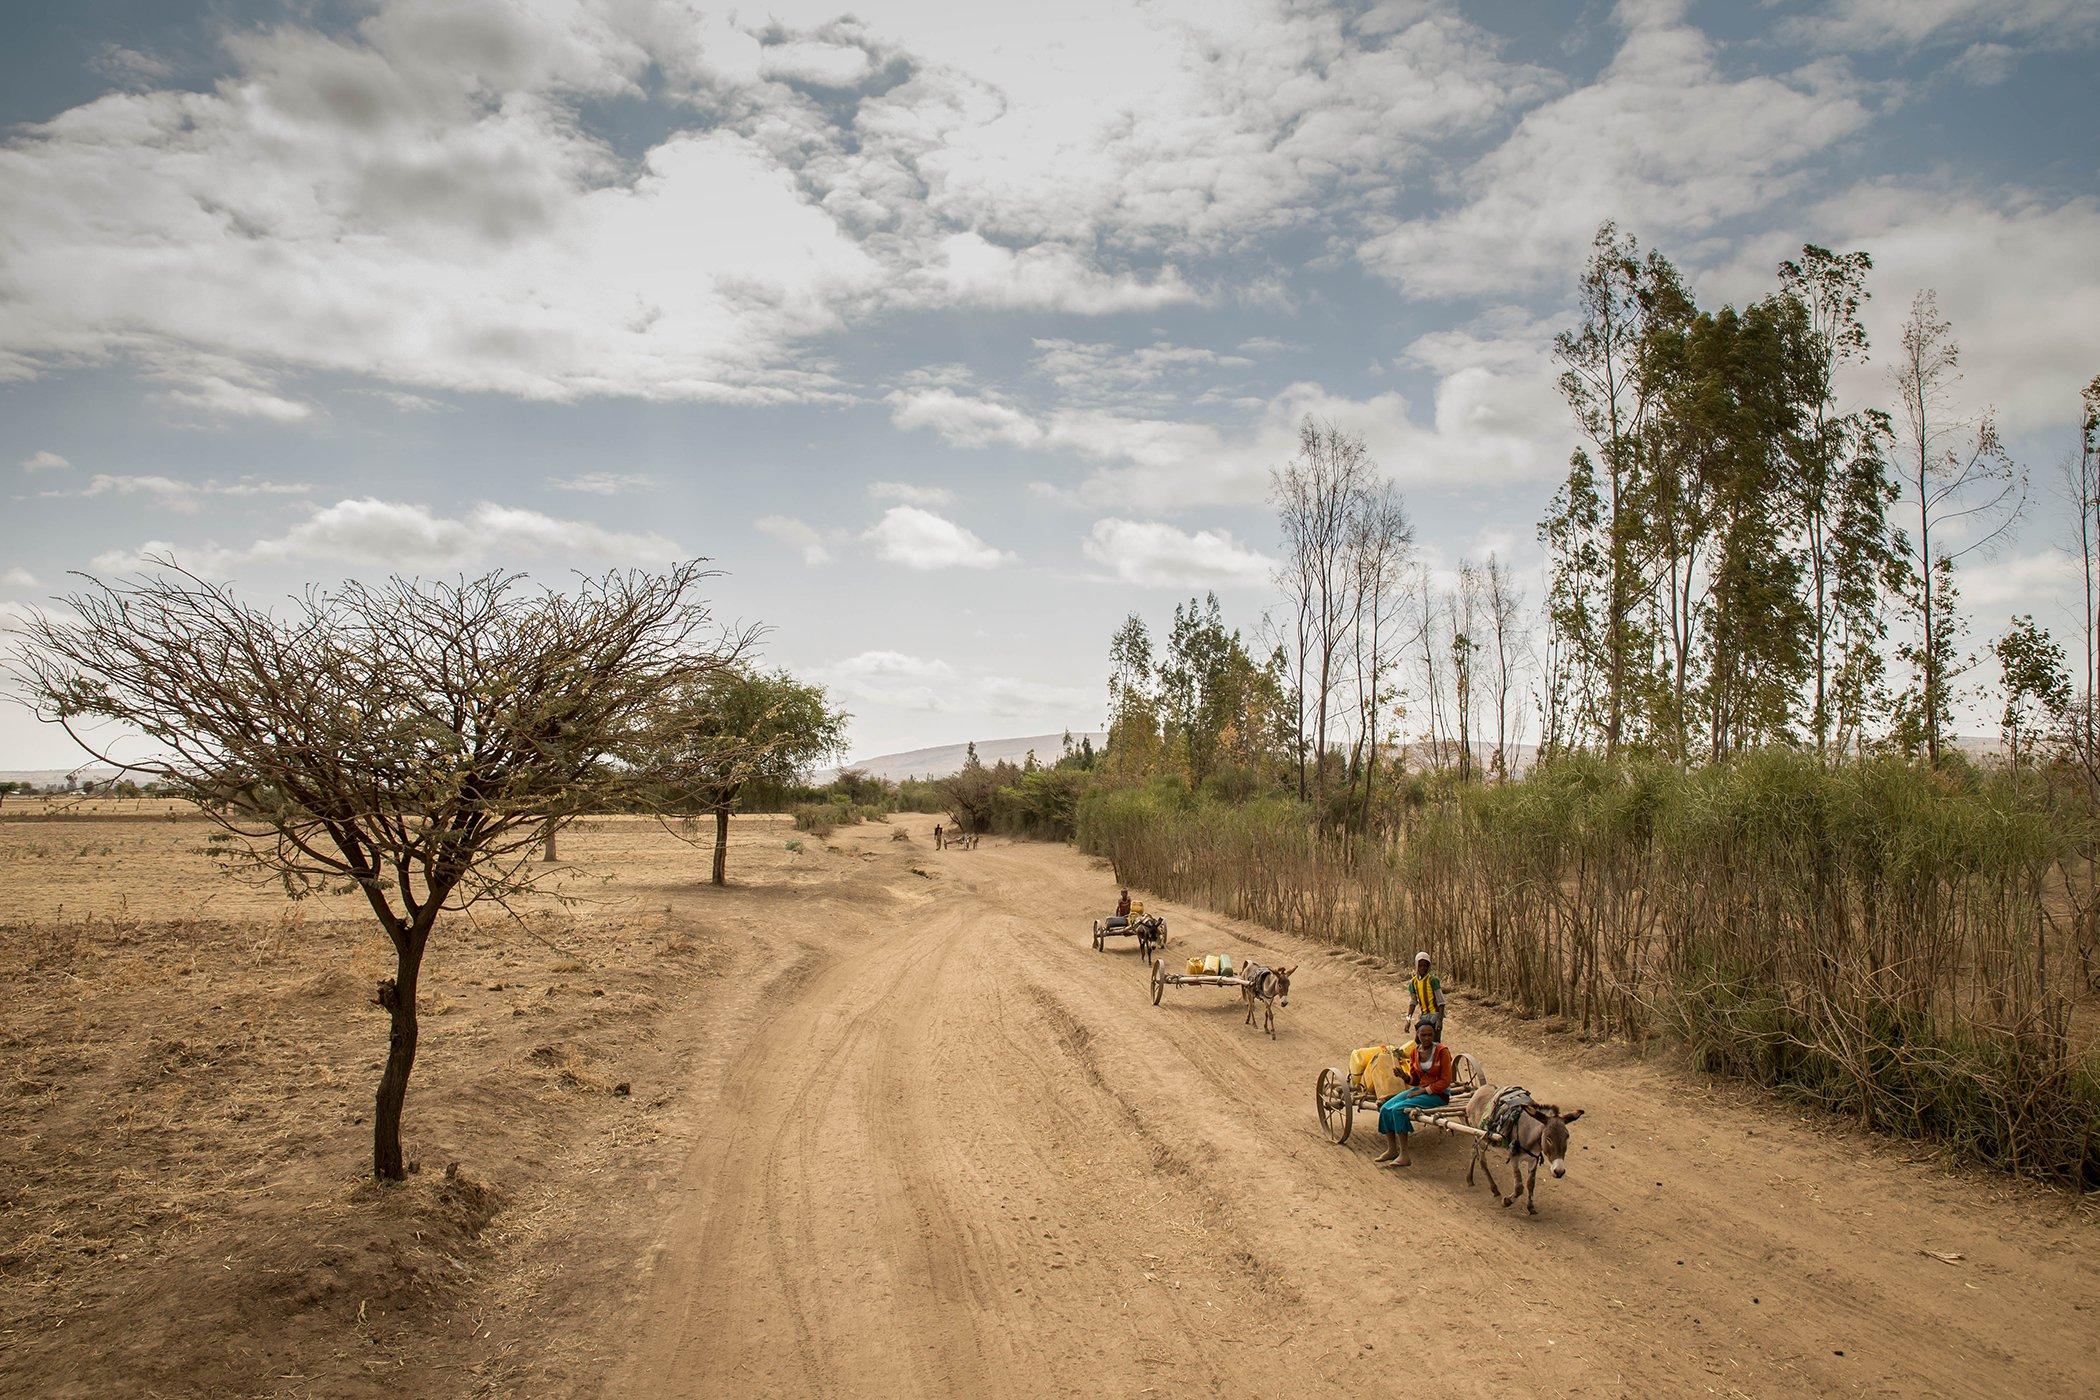 Climate-Change-Refugees-Ethiopia.jpg